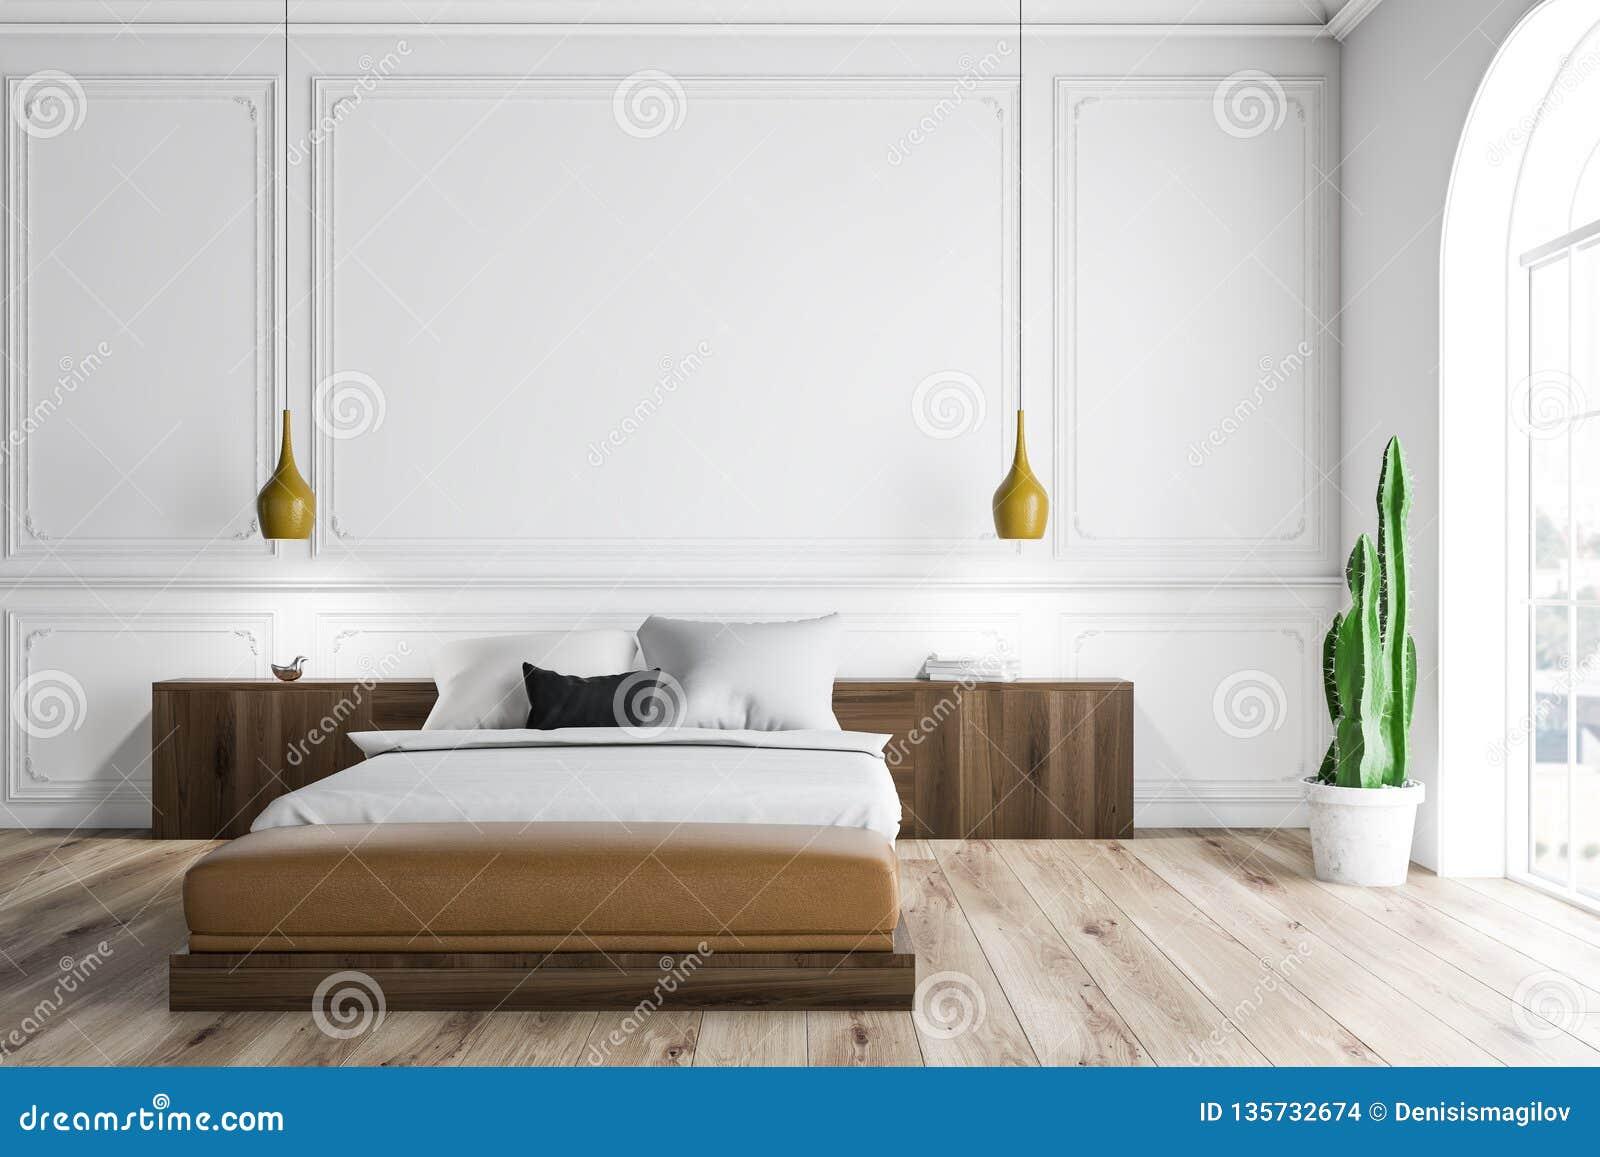 White bedroom interior stock illustration. Illustration of ...